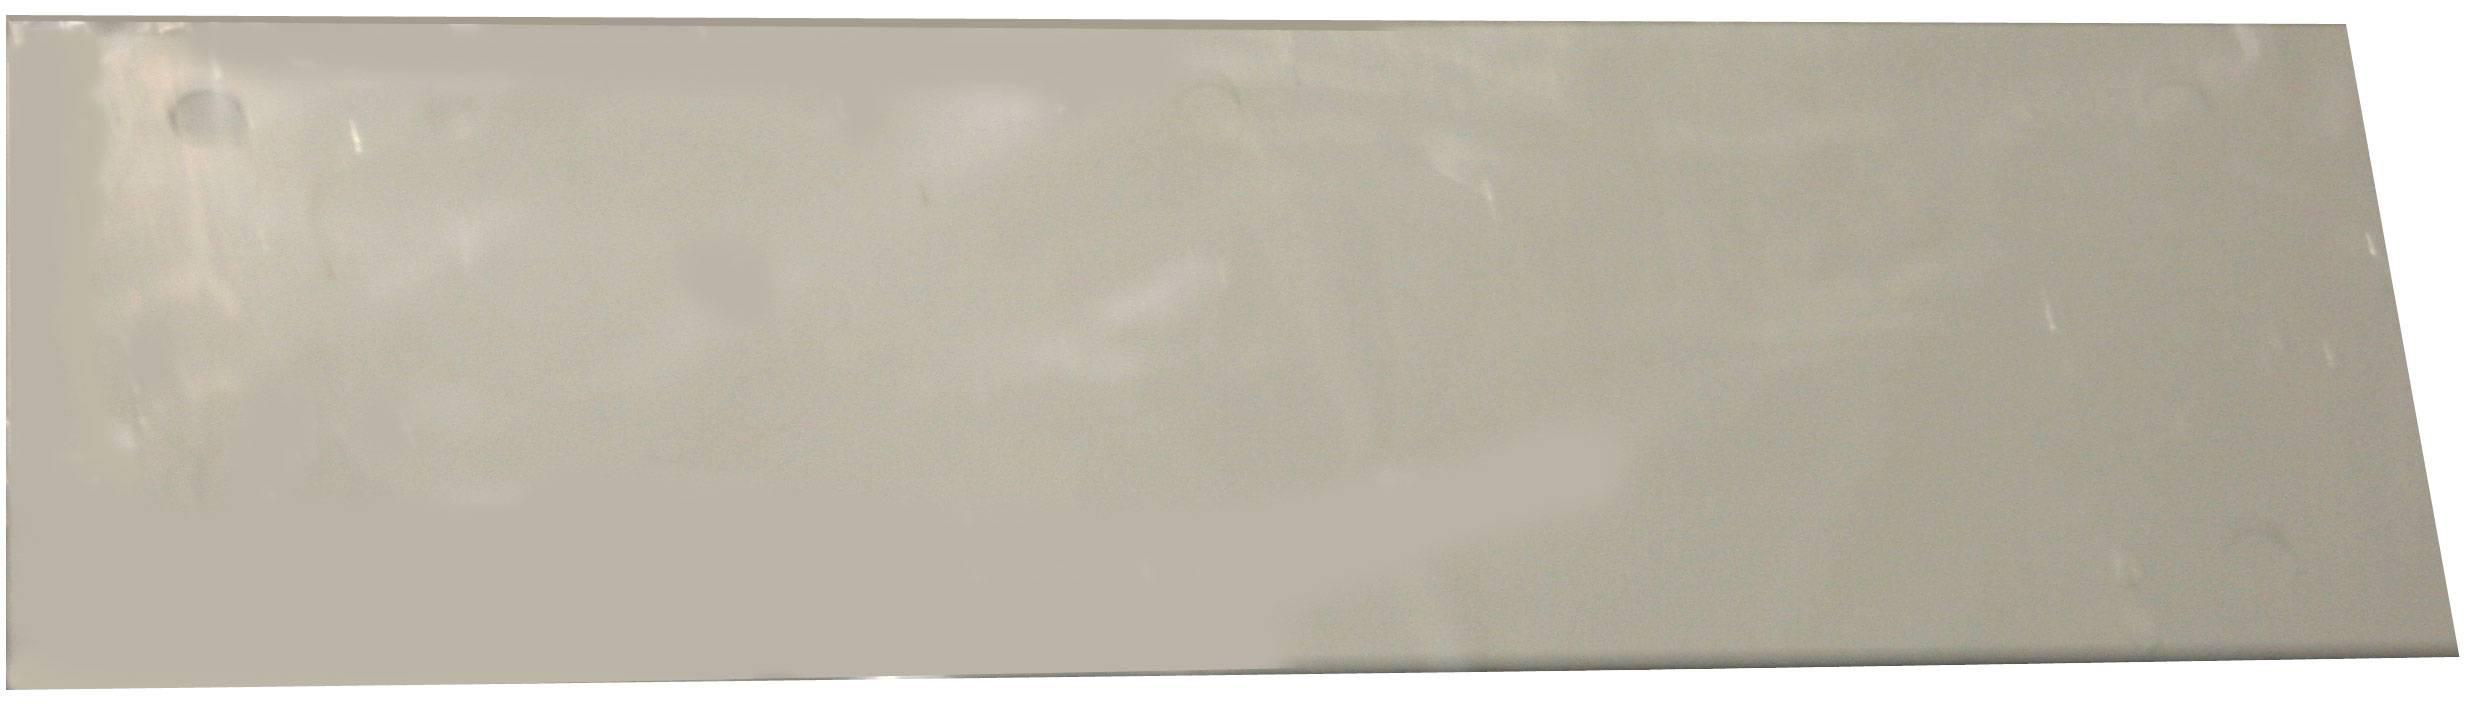 Čelný panel Strapubox TWORZYWA SZT.-FP 2 MM C0, 215 mm, umelá hmota, sivá, 1 ks